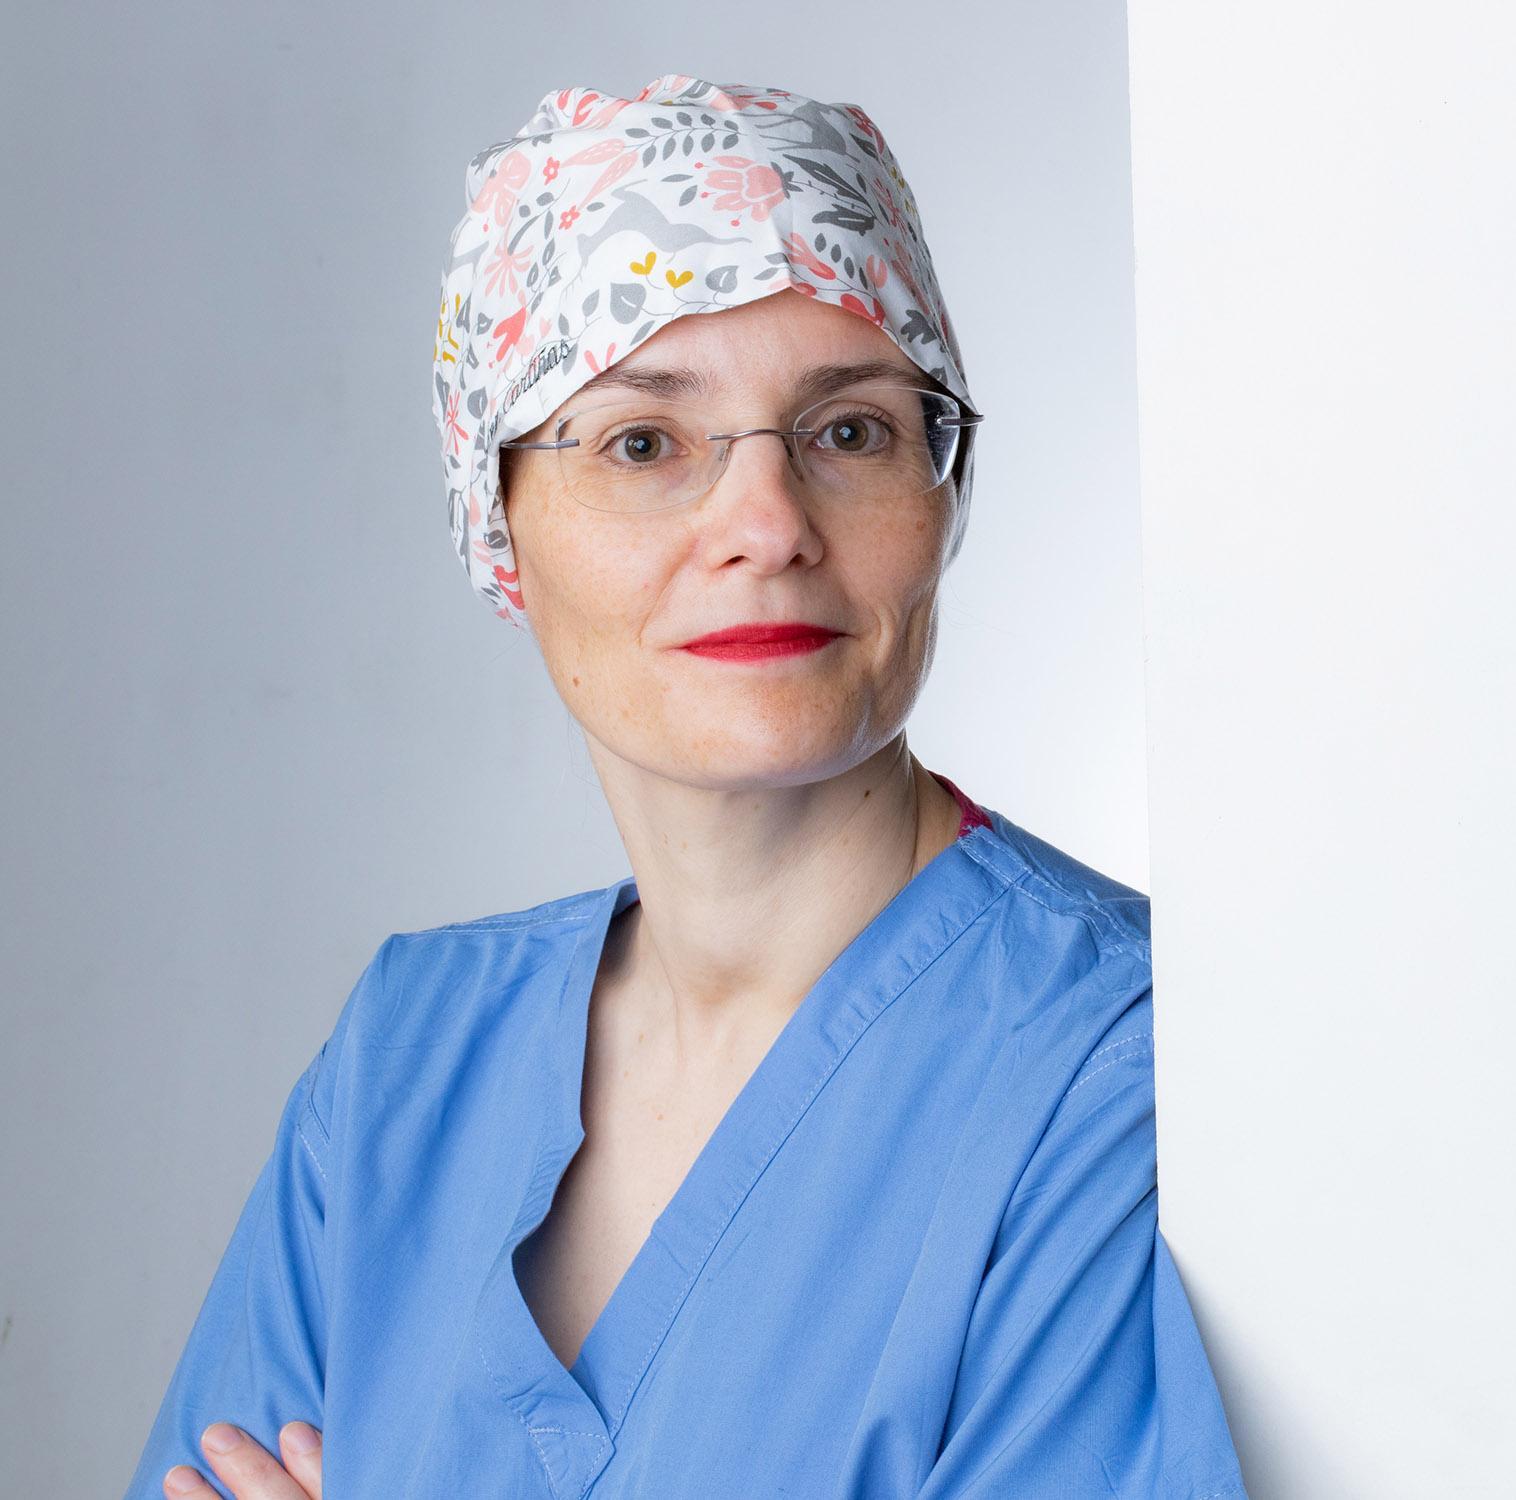 Ana Belén Fernández Cortiñas